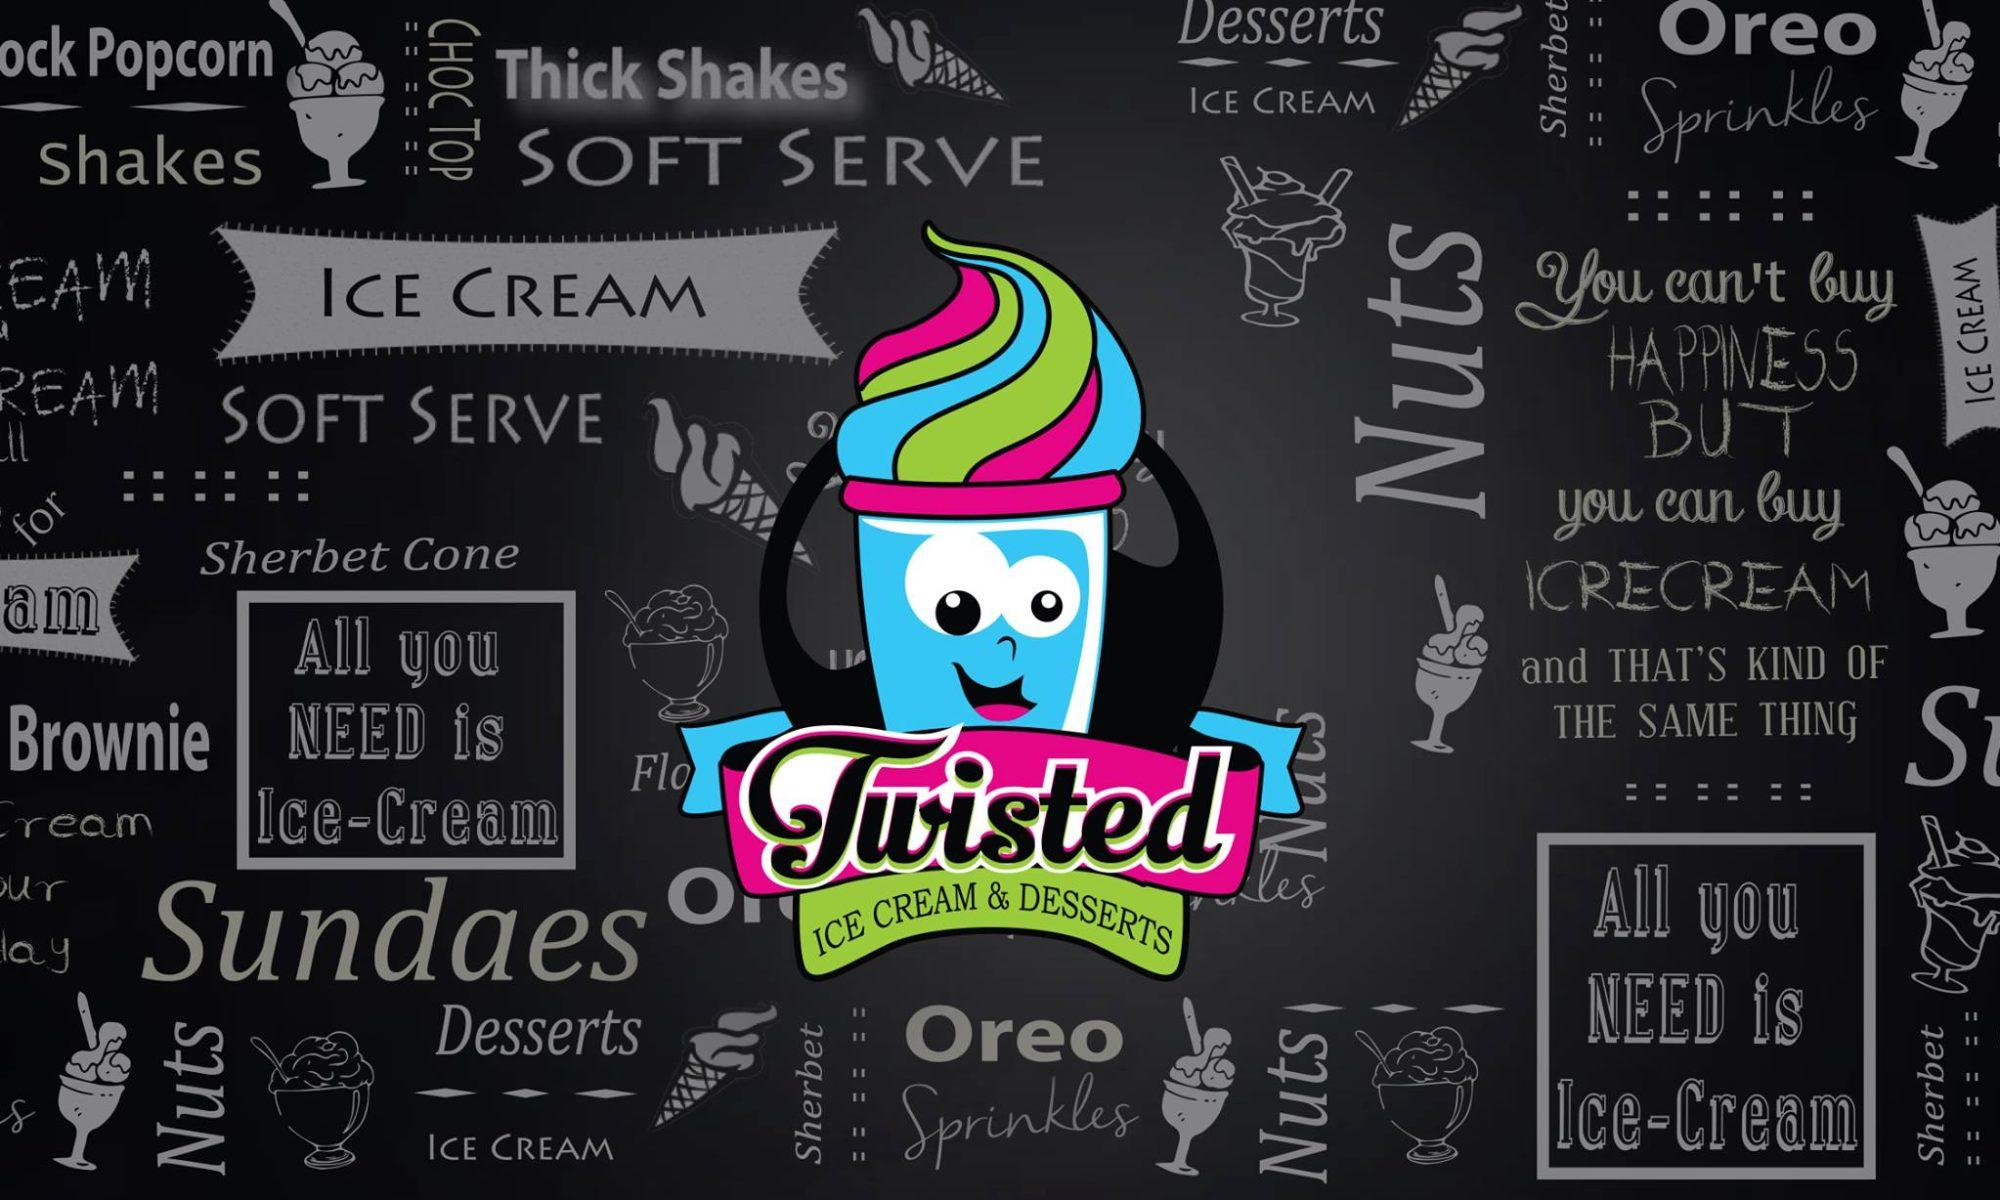 Twisted Ice Cream